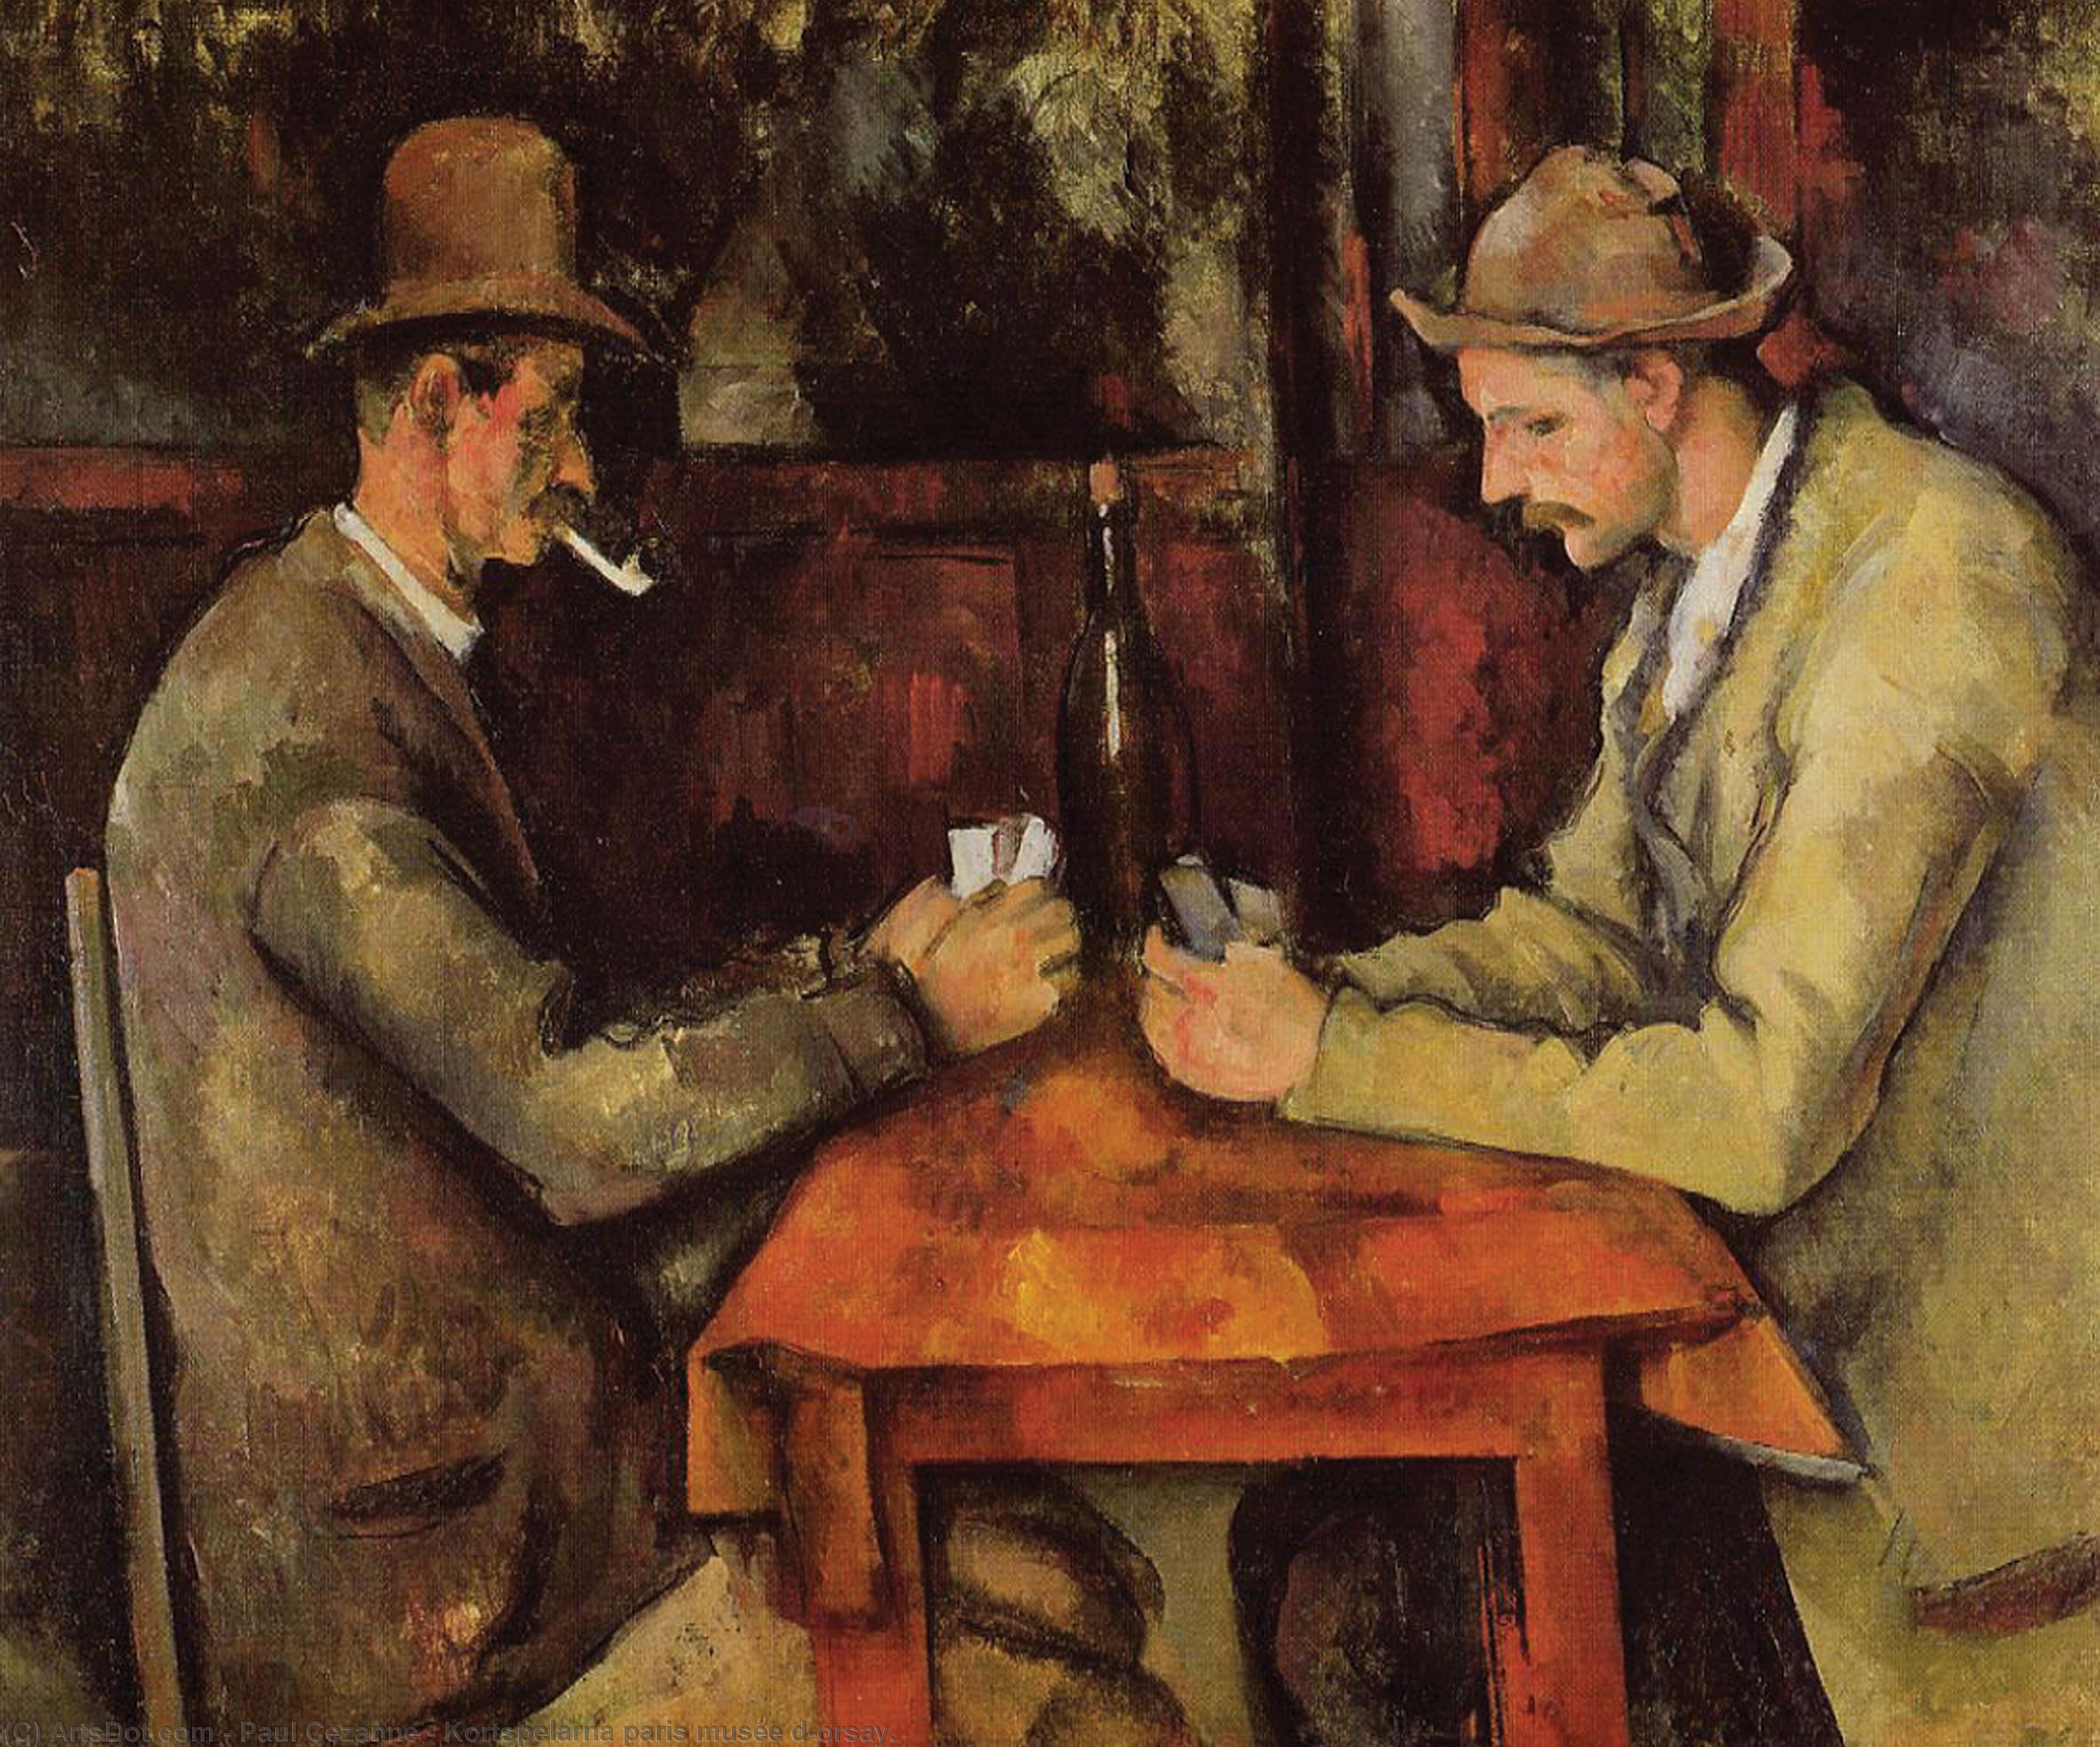 Wikioo.org - The Encyclopedia of Fine Arts - Painting, Artwork by Paul Cezanne - Kortspelarna paris musée d'orsay.